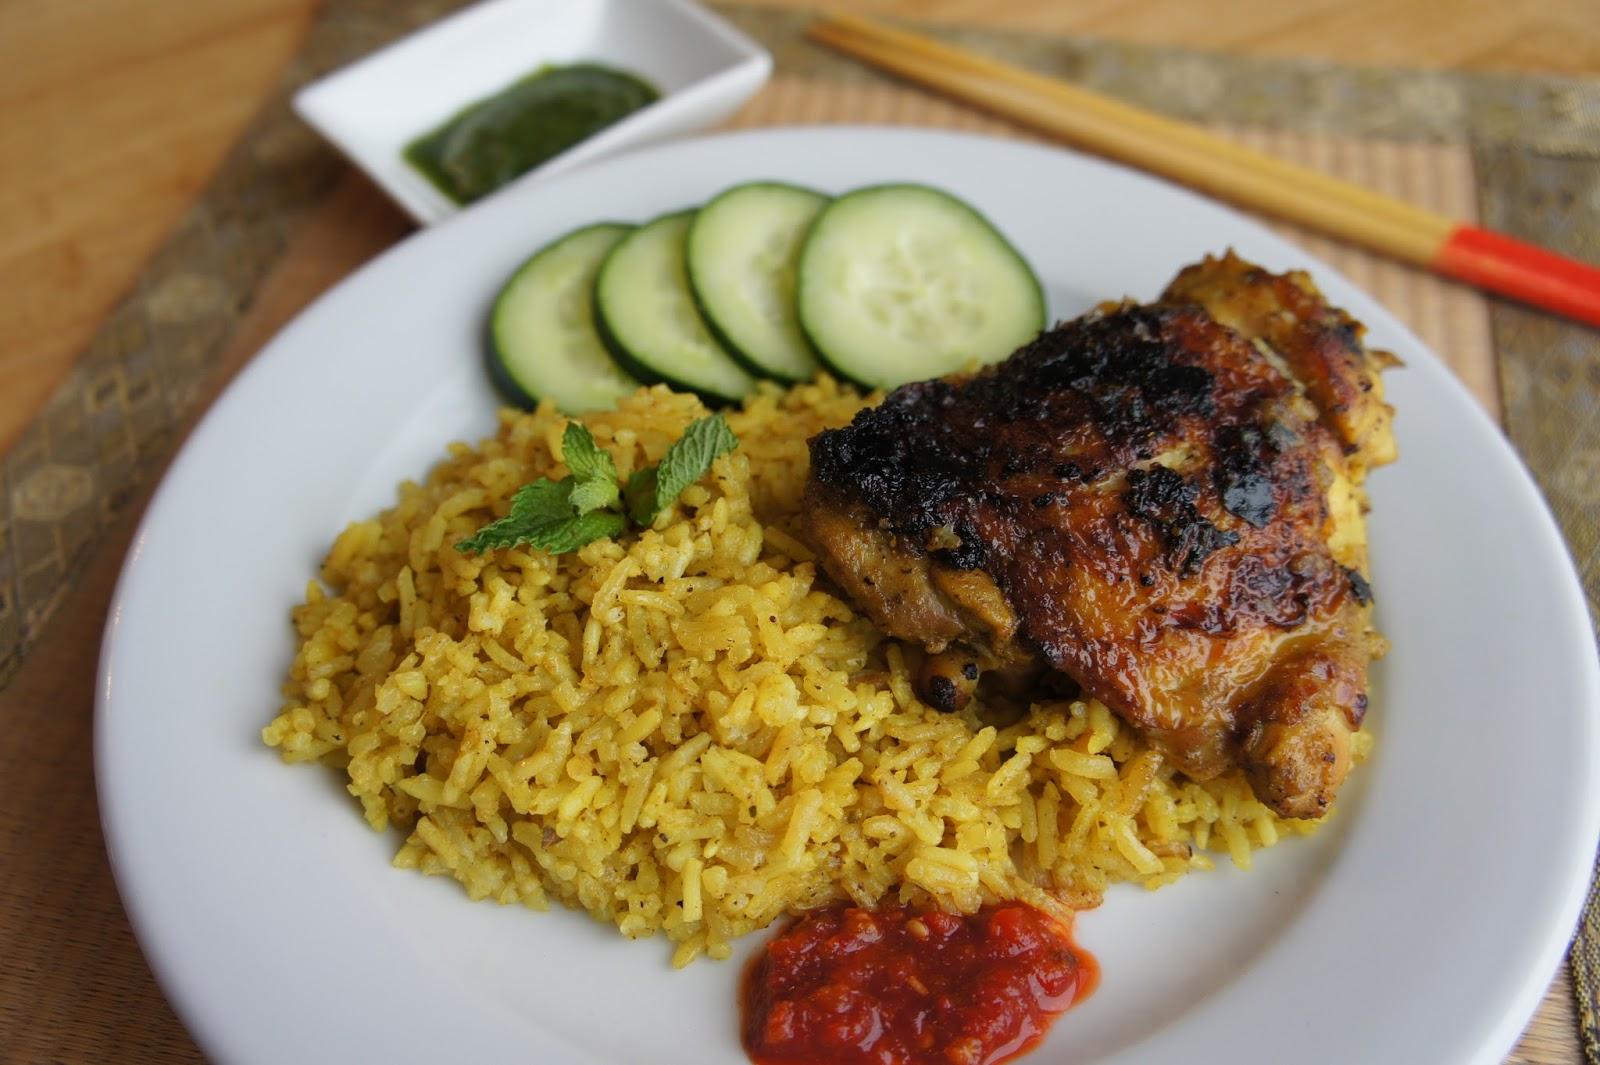 chicken biryani recipe in hindi language pdf